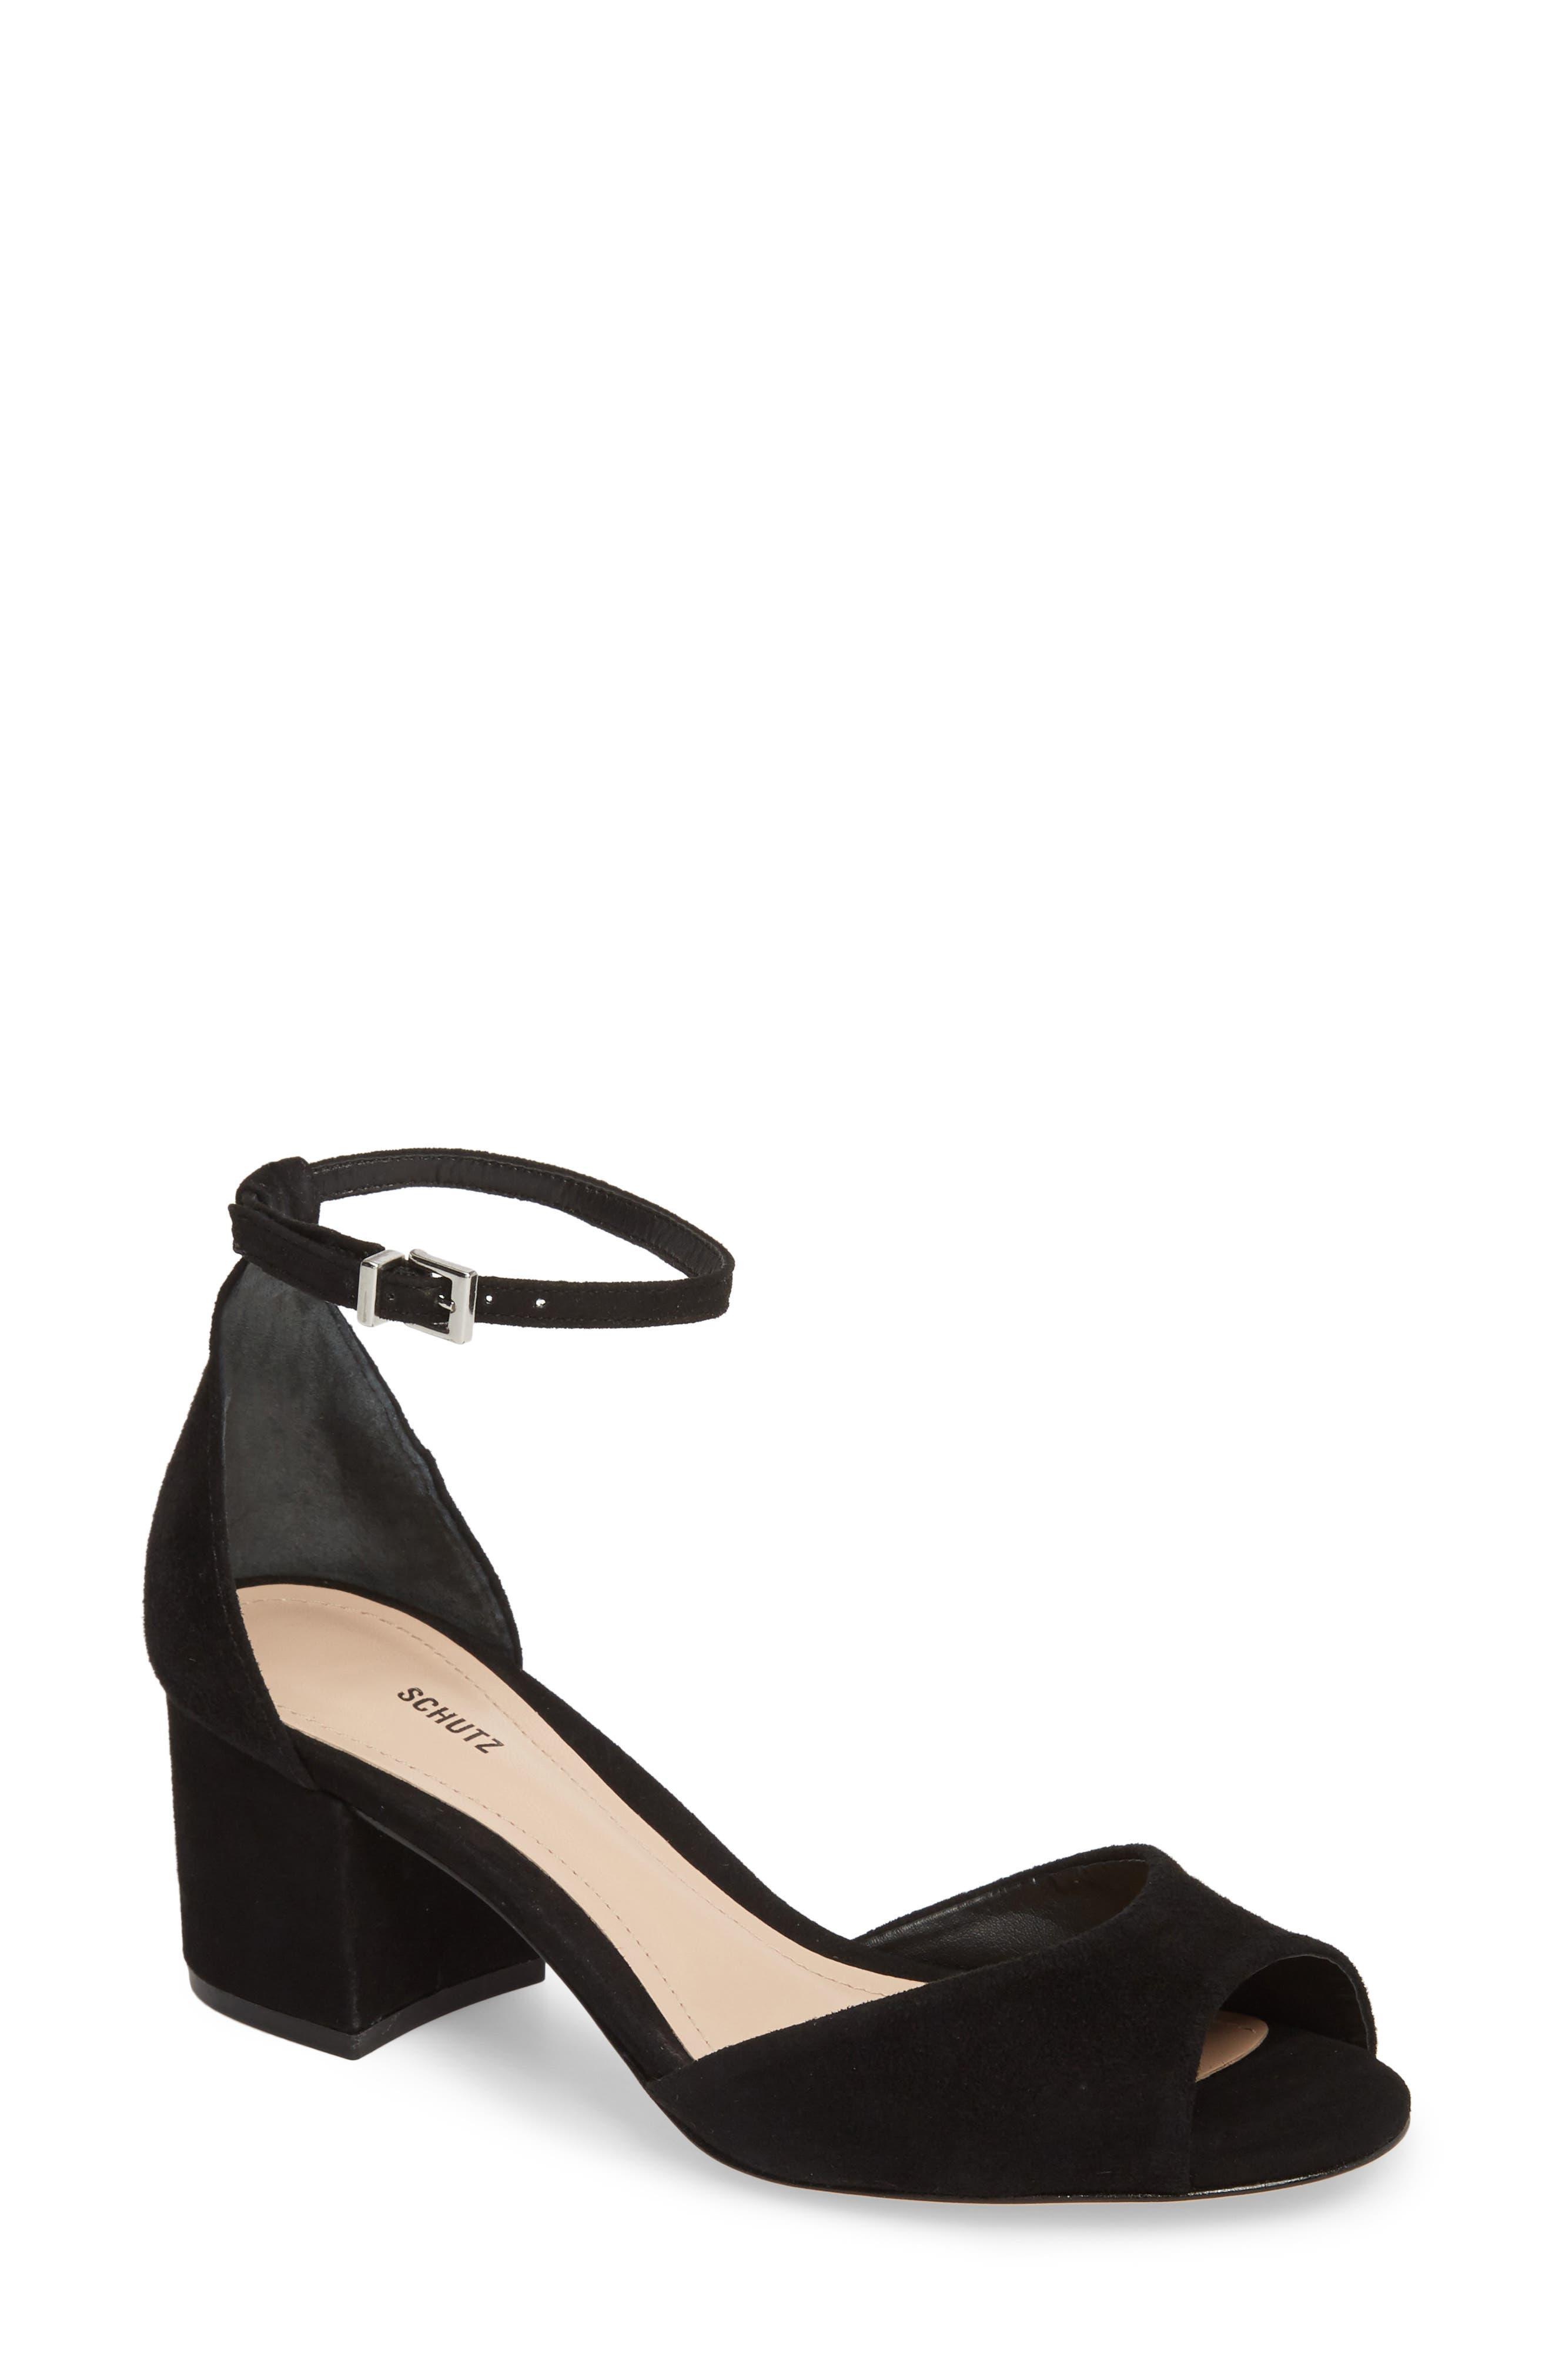 Roama Block Heel Sandal,                             Main thumbnail 1, color,                             Black Suede